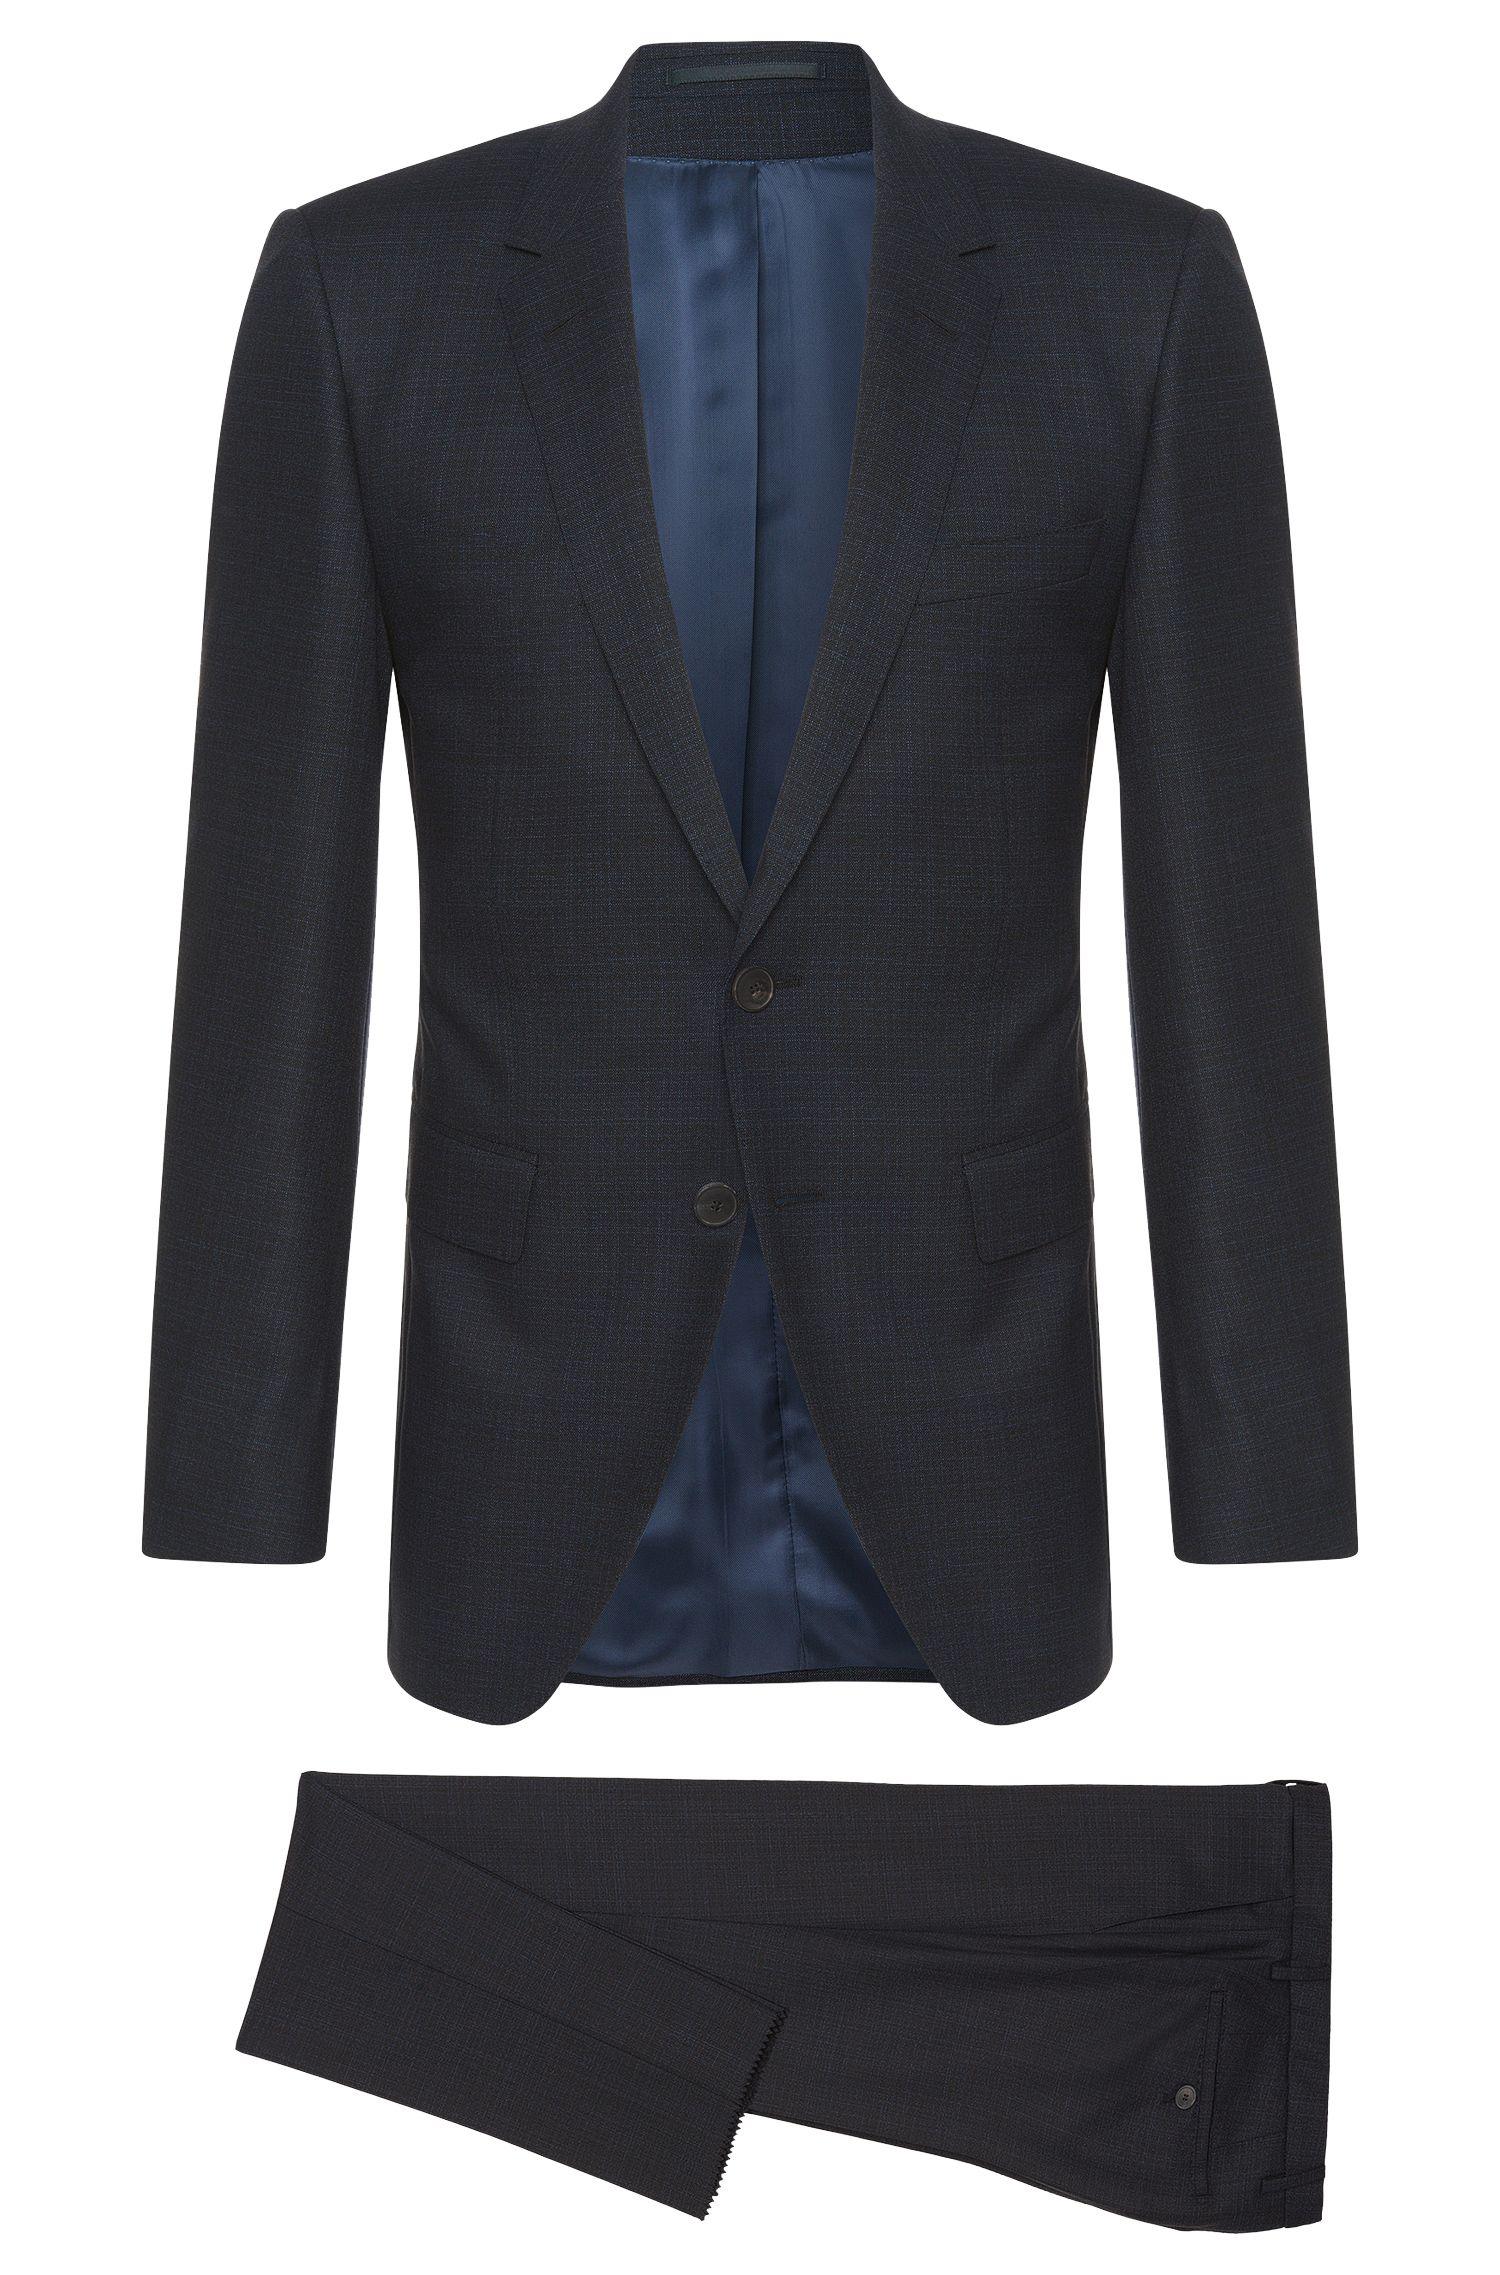 'T-Reeve/Wain' | Extra Slim Fit, Super 150 Italian Wool Suit